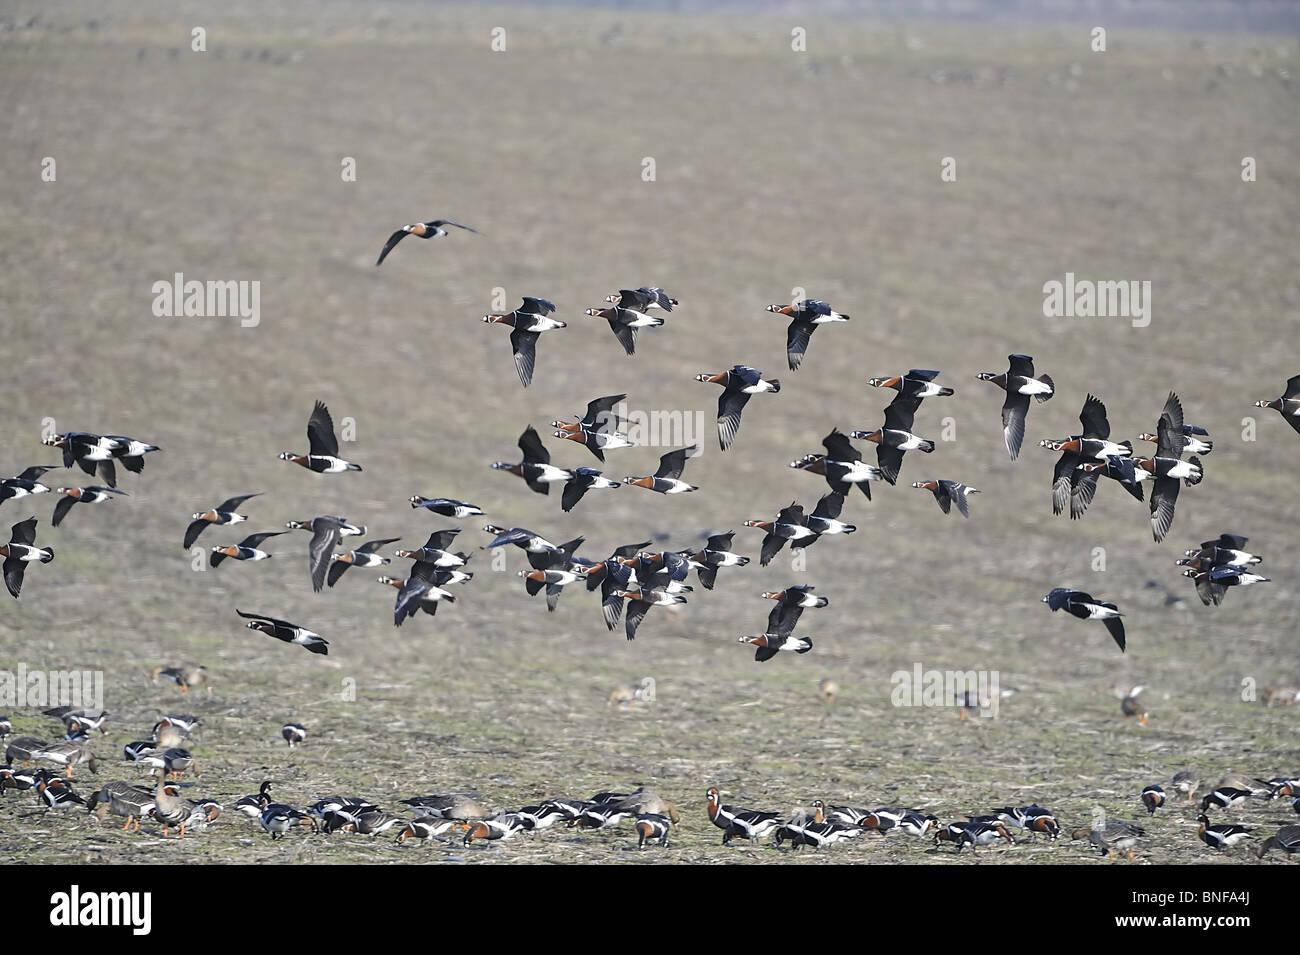 Flock of Red breasted geese (Branta ruficolis) in flight in winter - Stock Image